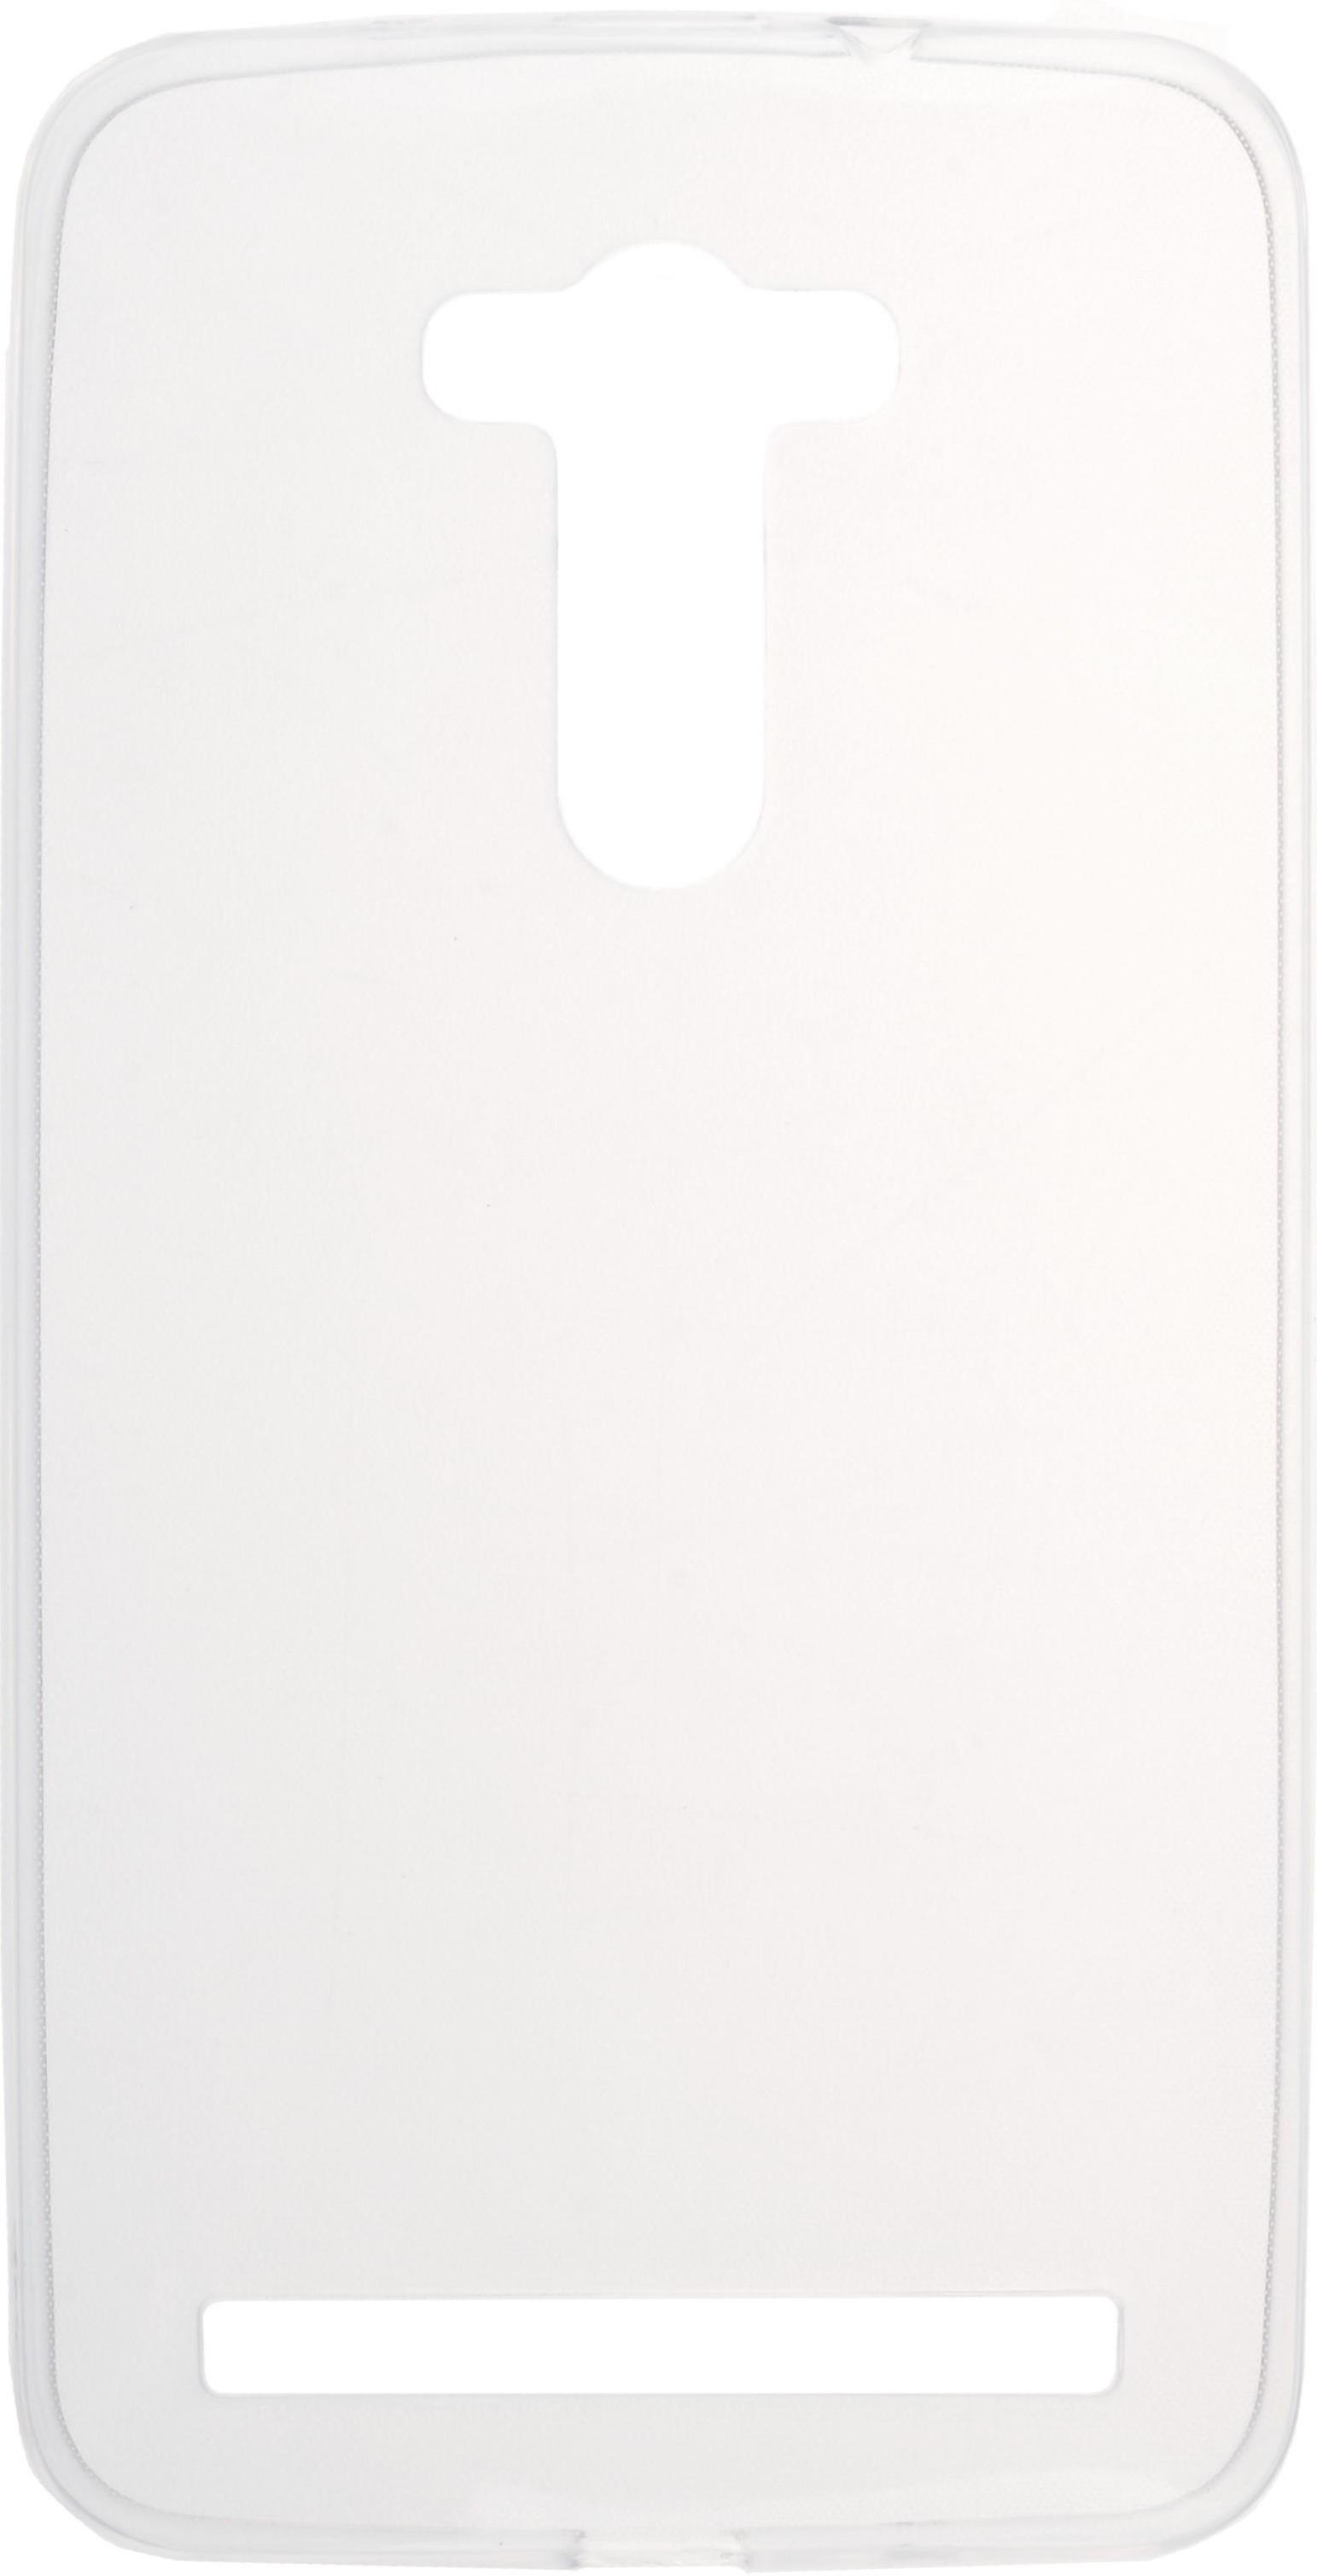 Чехол для сотового телефона skinBOX Slim Silicone, 4660041407242, прозрачный цена и фото